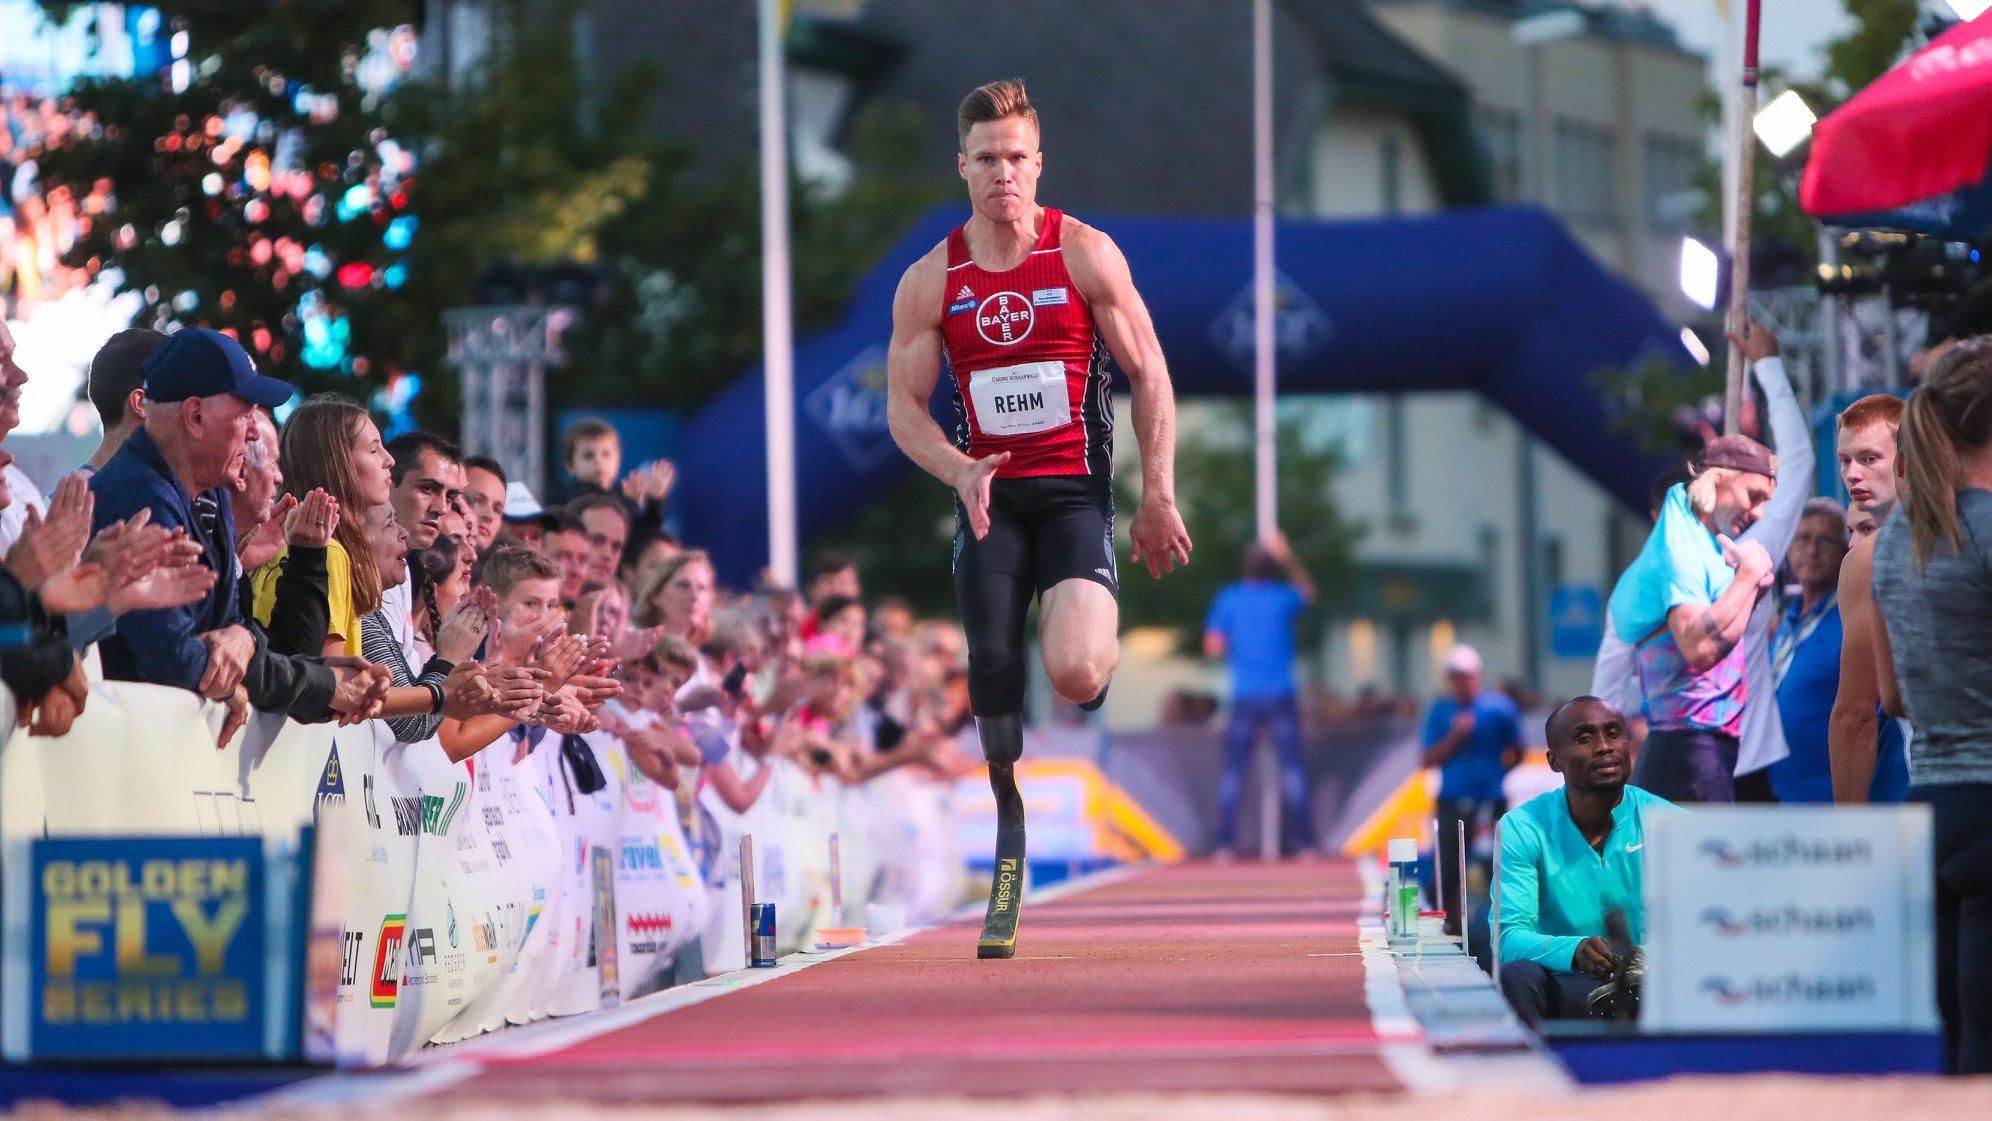 winner long jump Markus Rehm GER runway.jpg